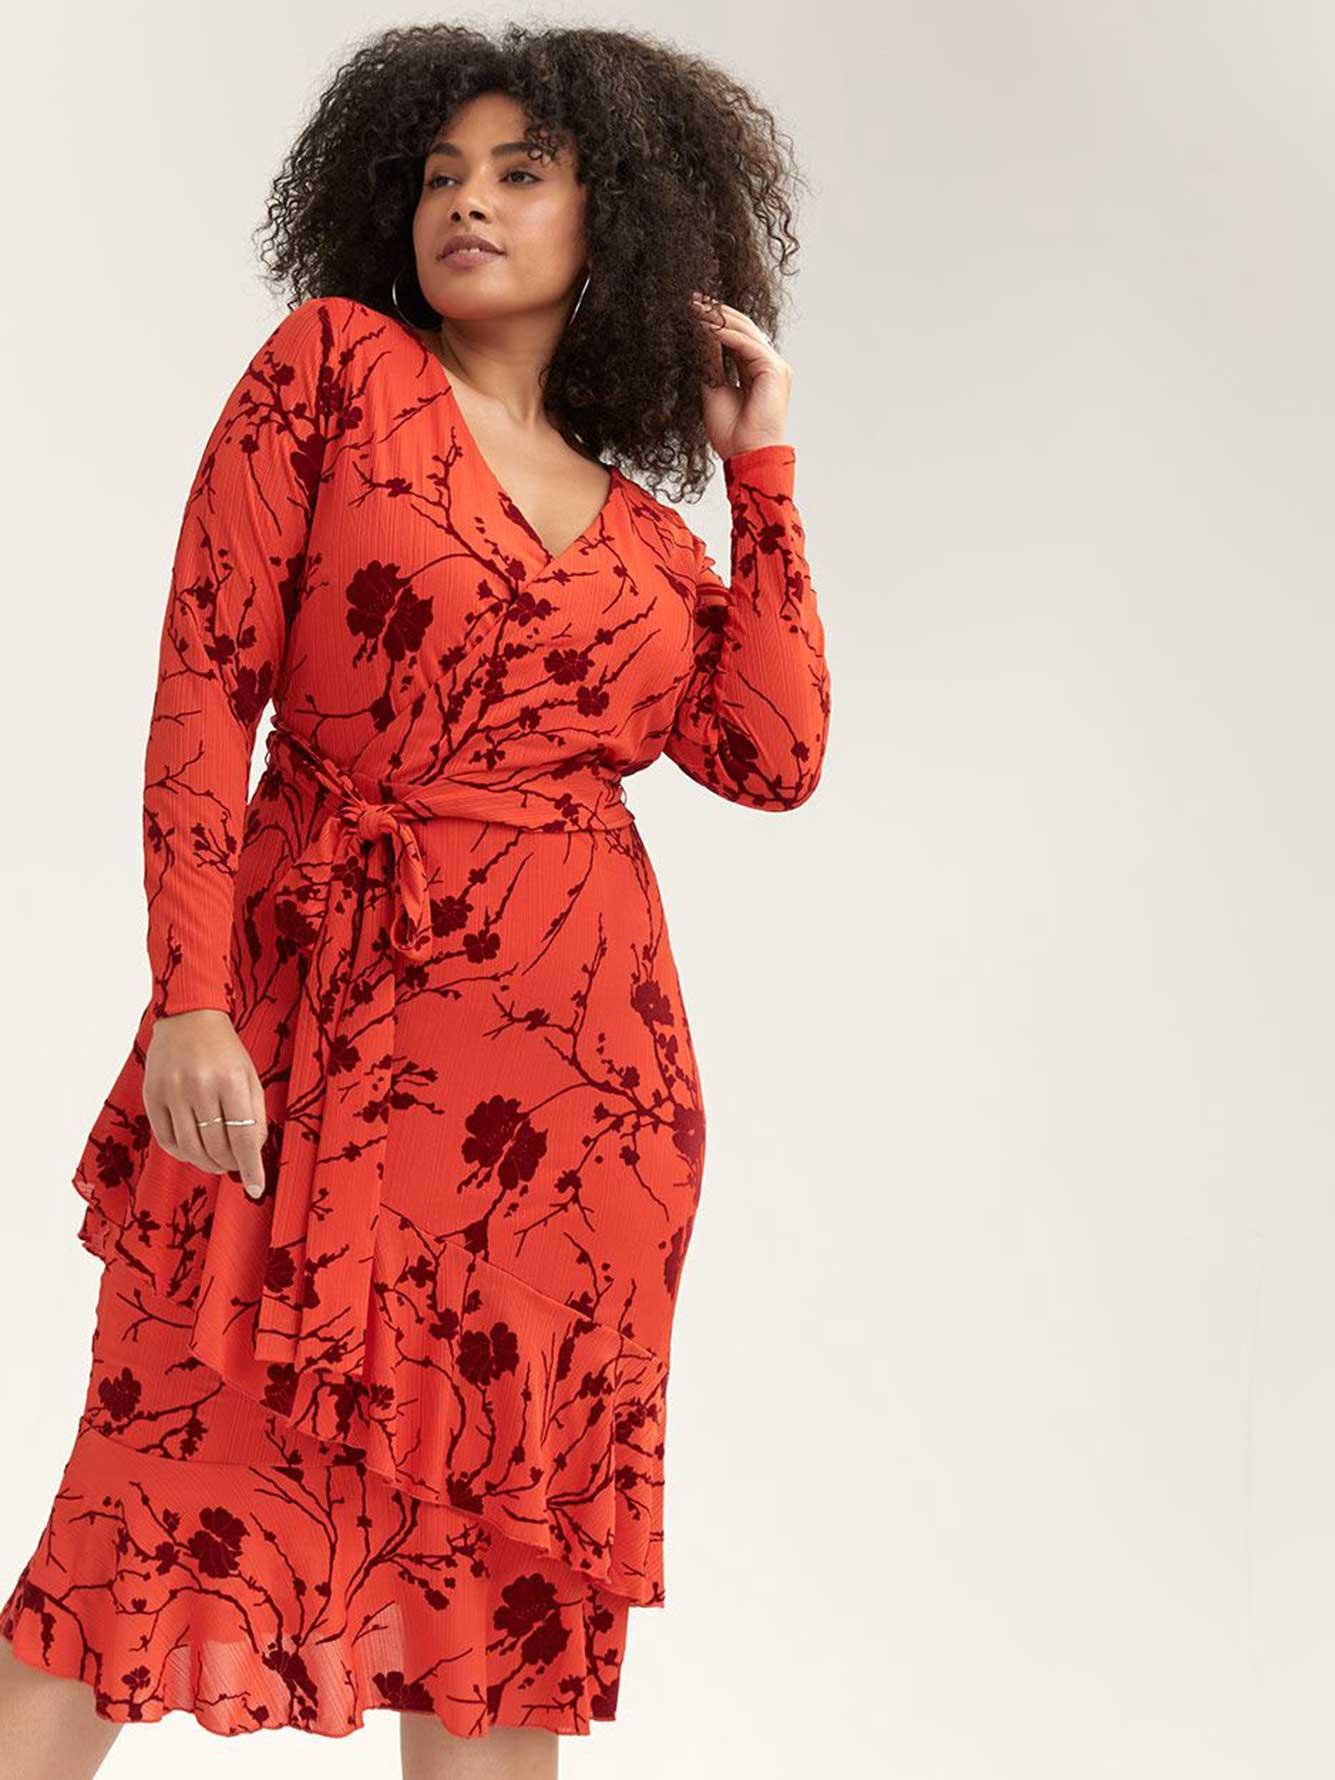 Tie-at-Waist Faux-Wrap Dress - RACHEL Rachel Roy